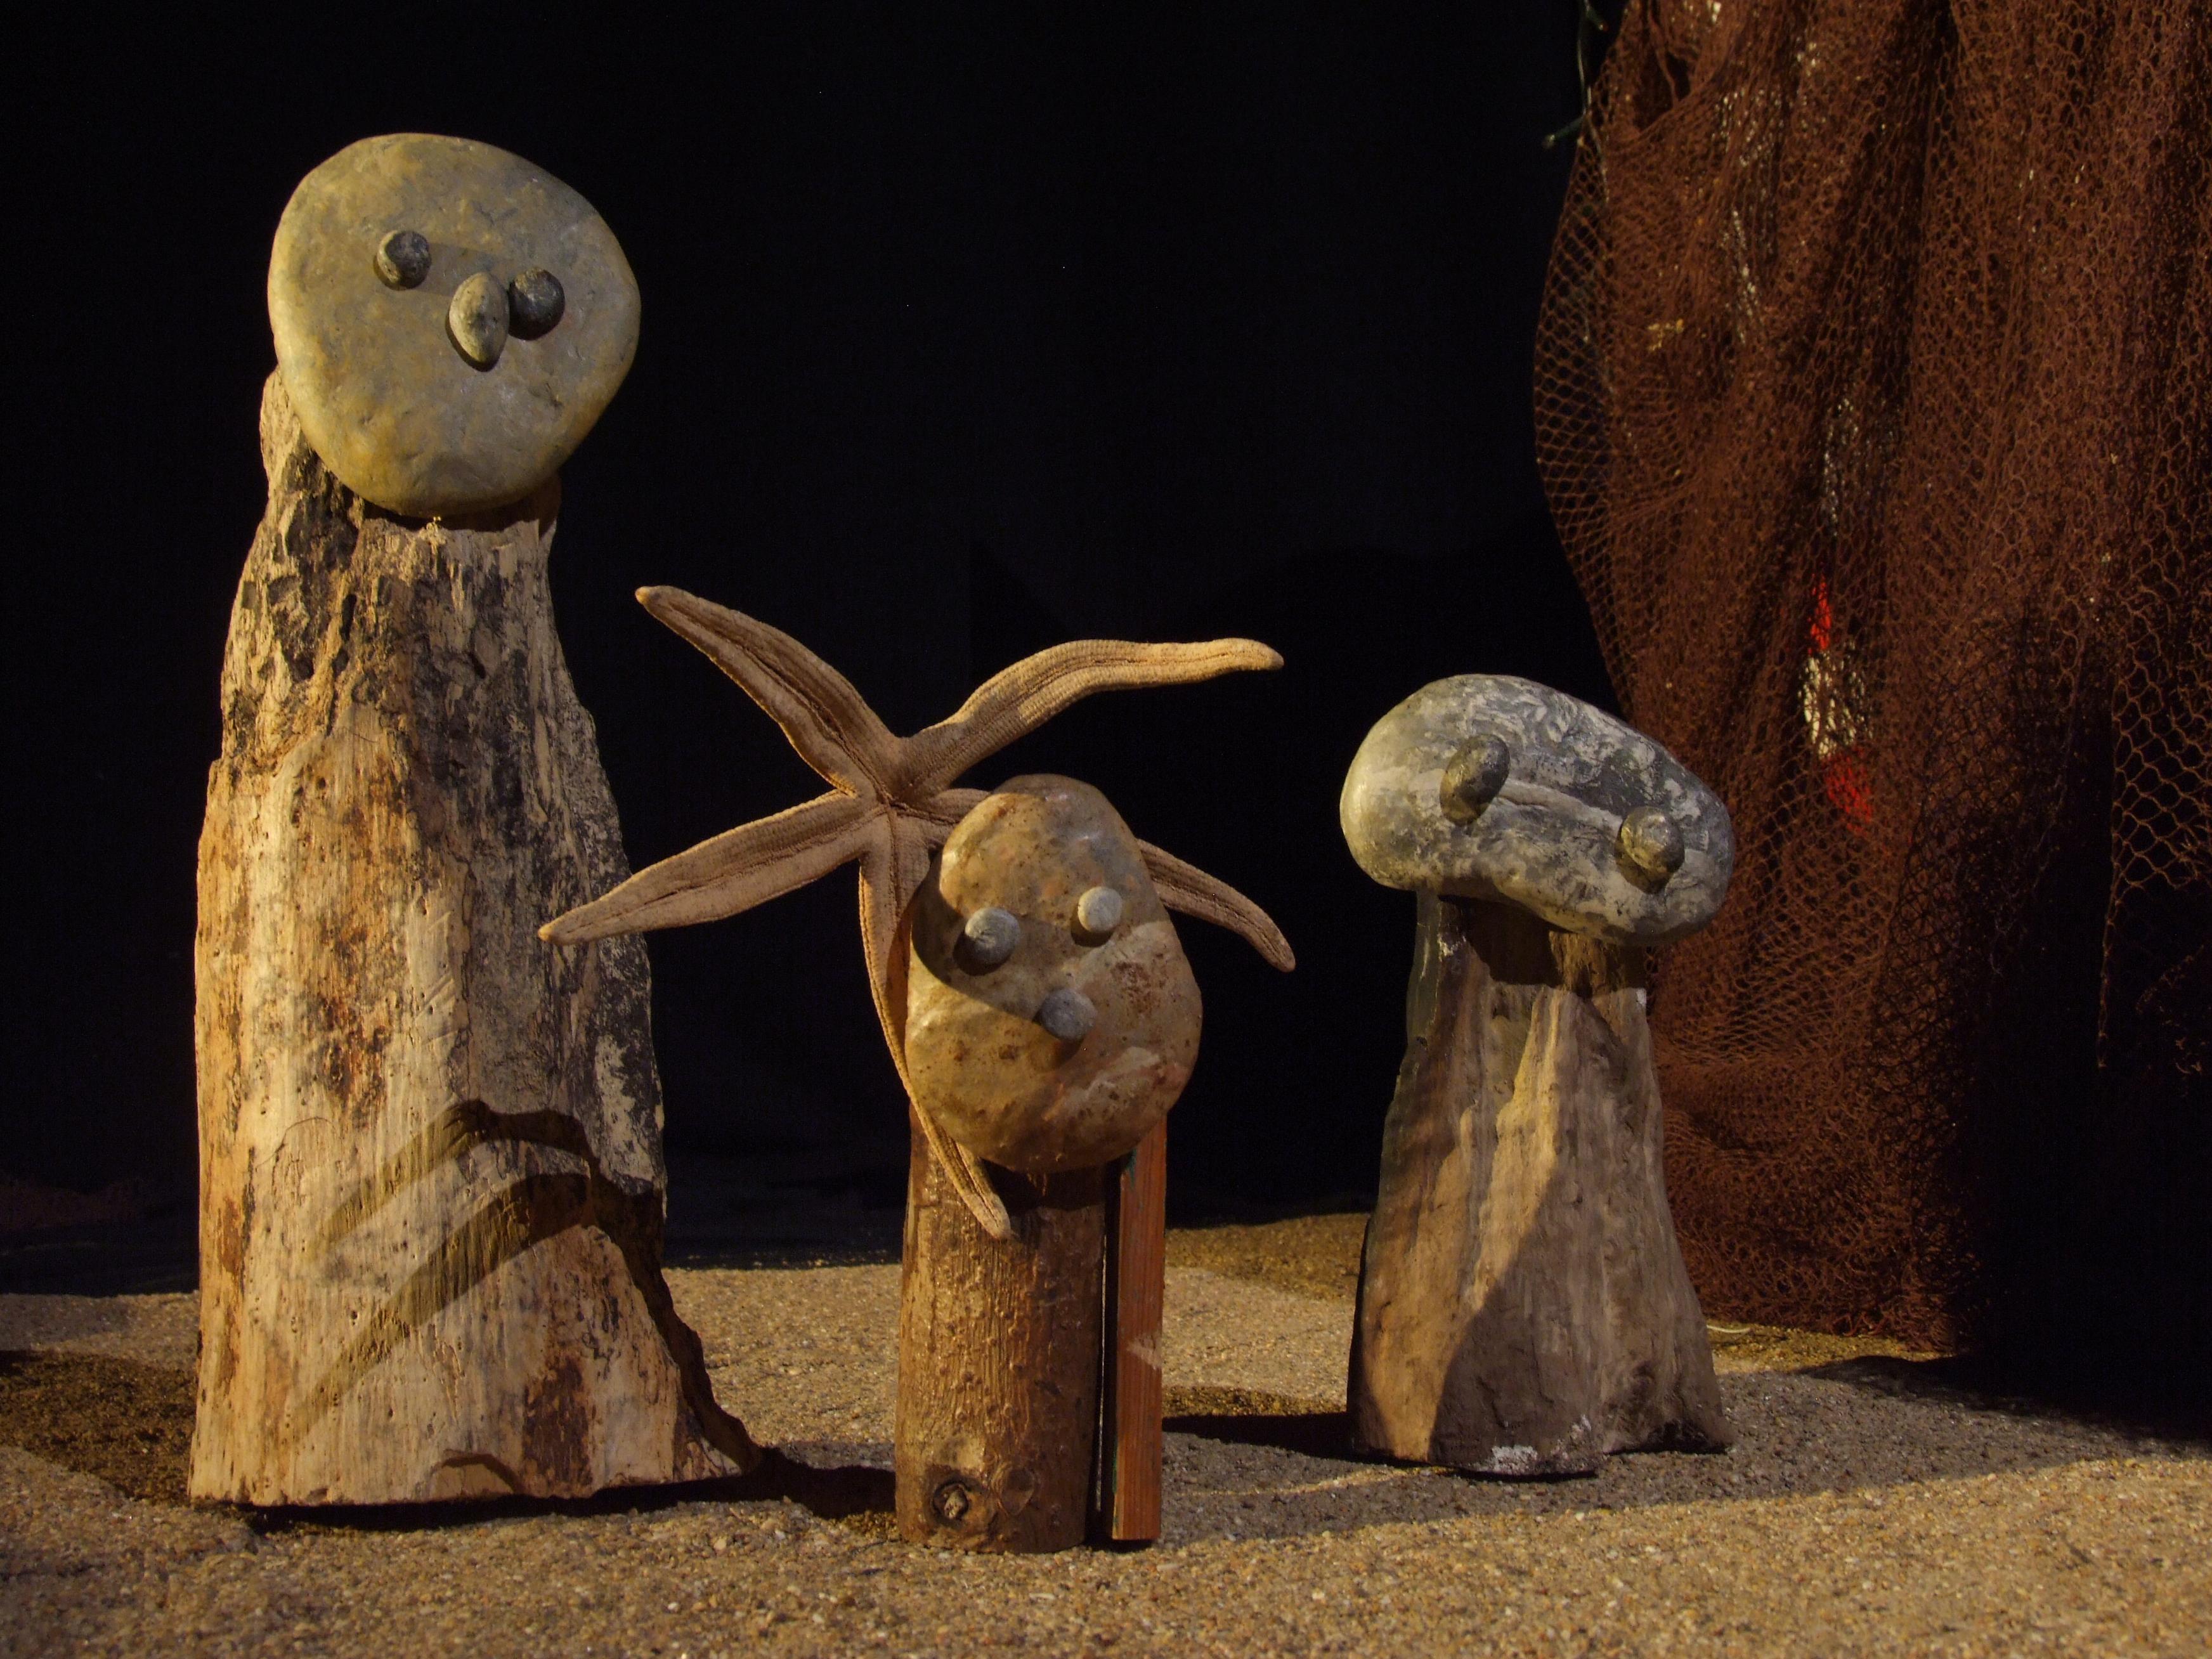 Pierre à pierre